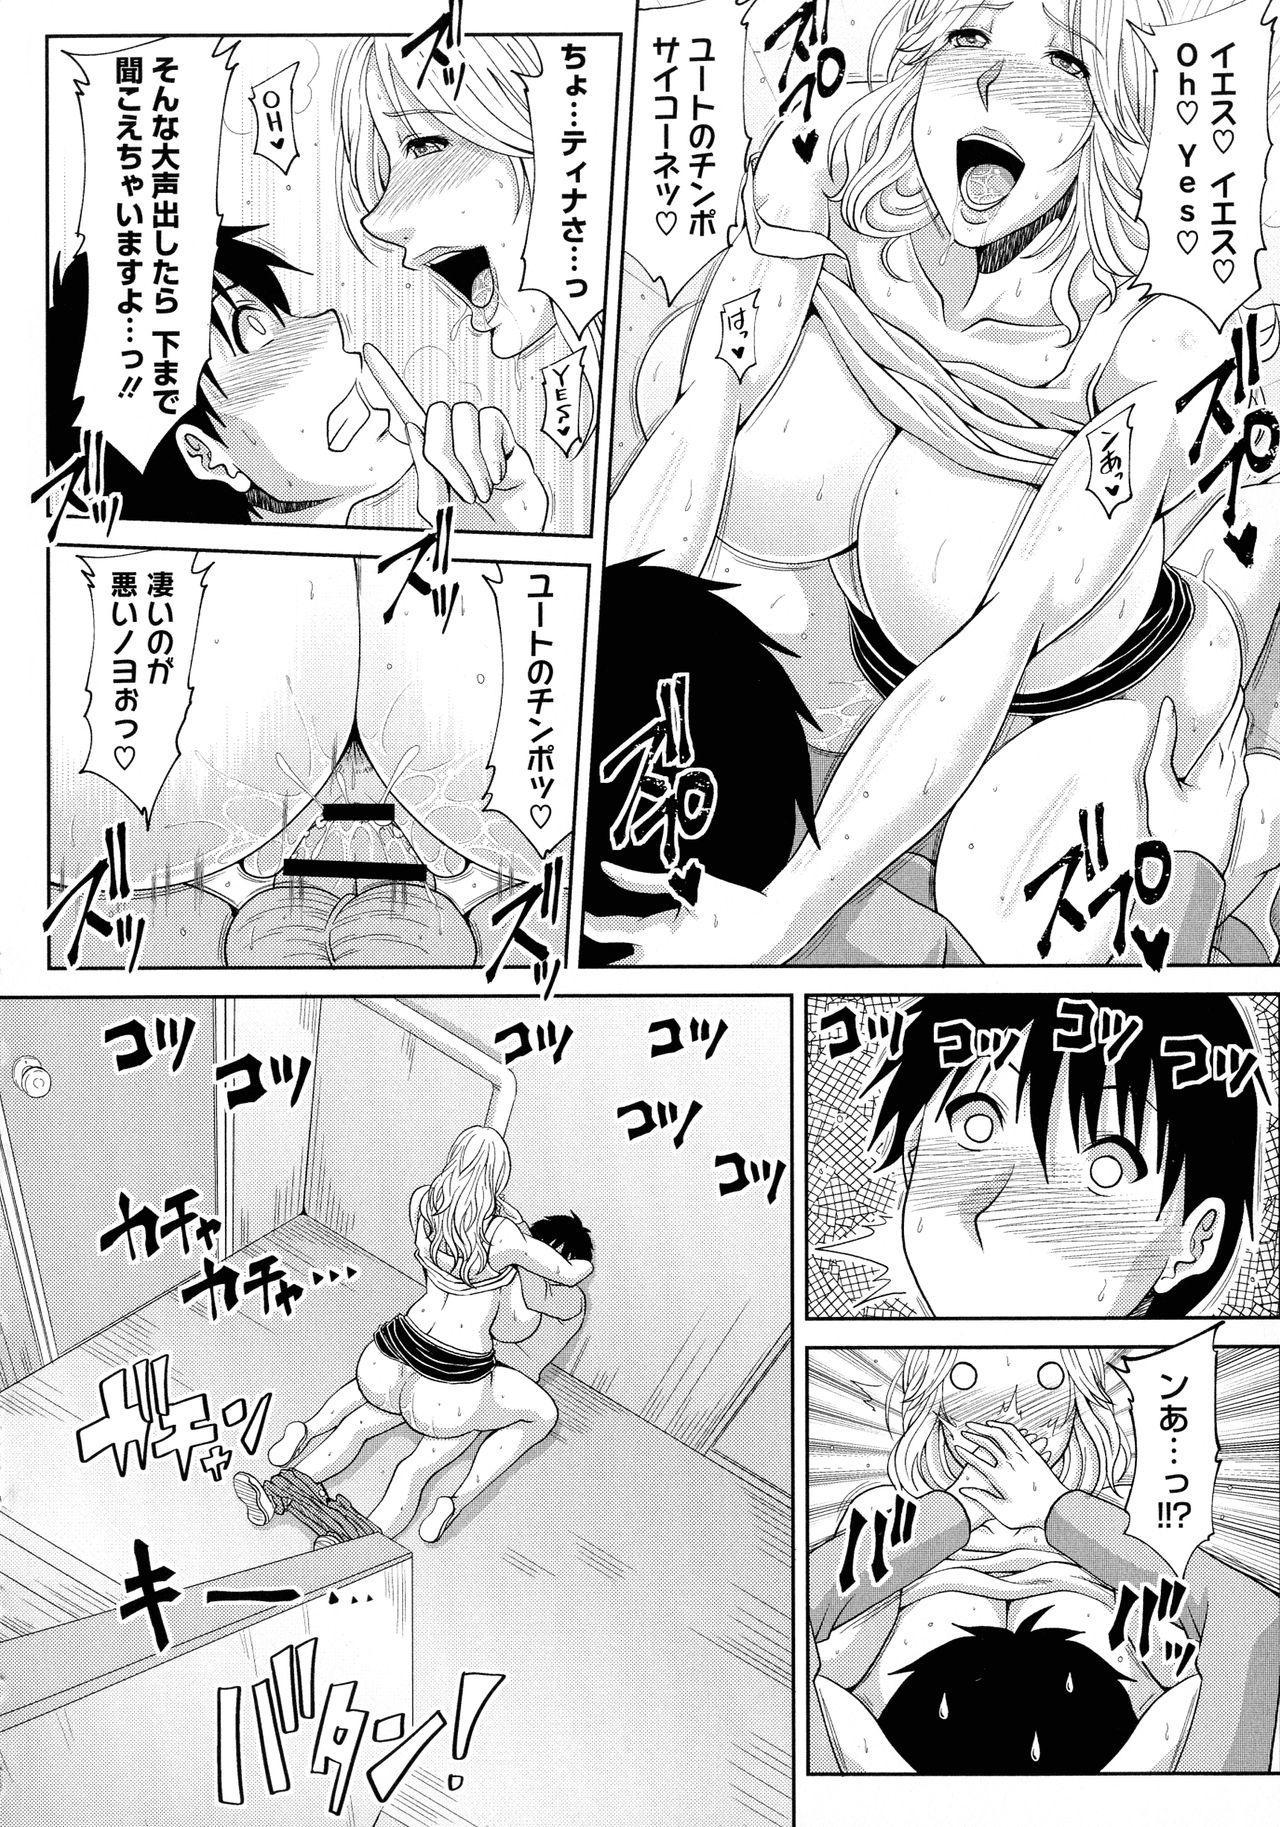 Haramase! 55